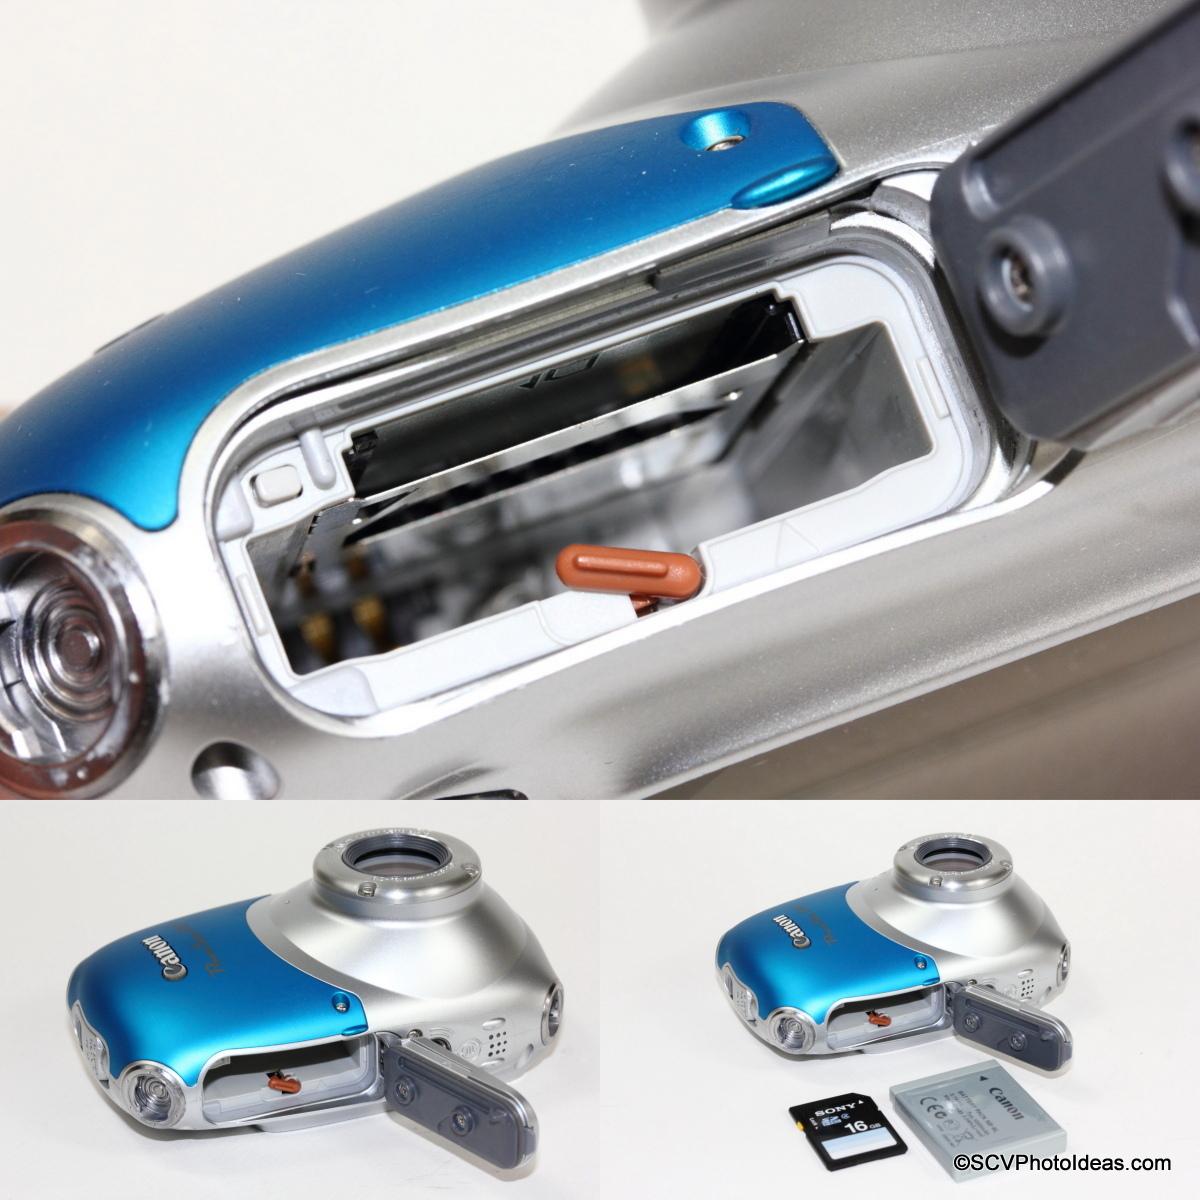 Canon PowerShot D10 Camera Memory and Battery slots